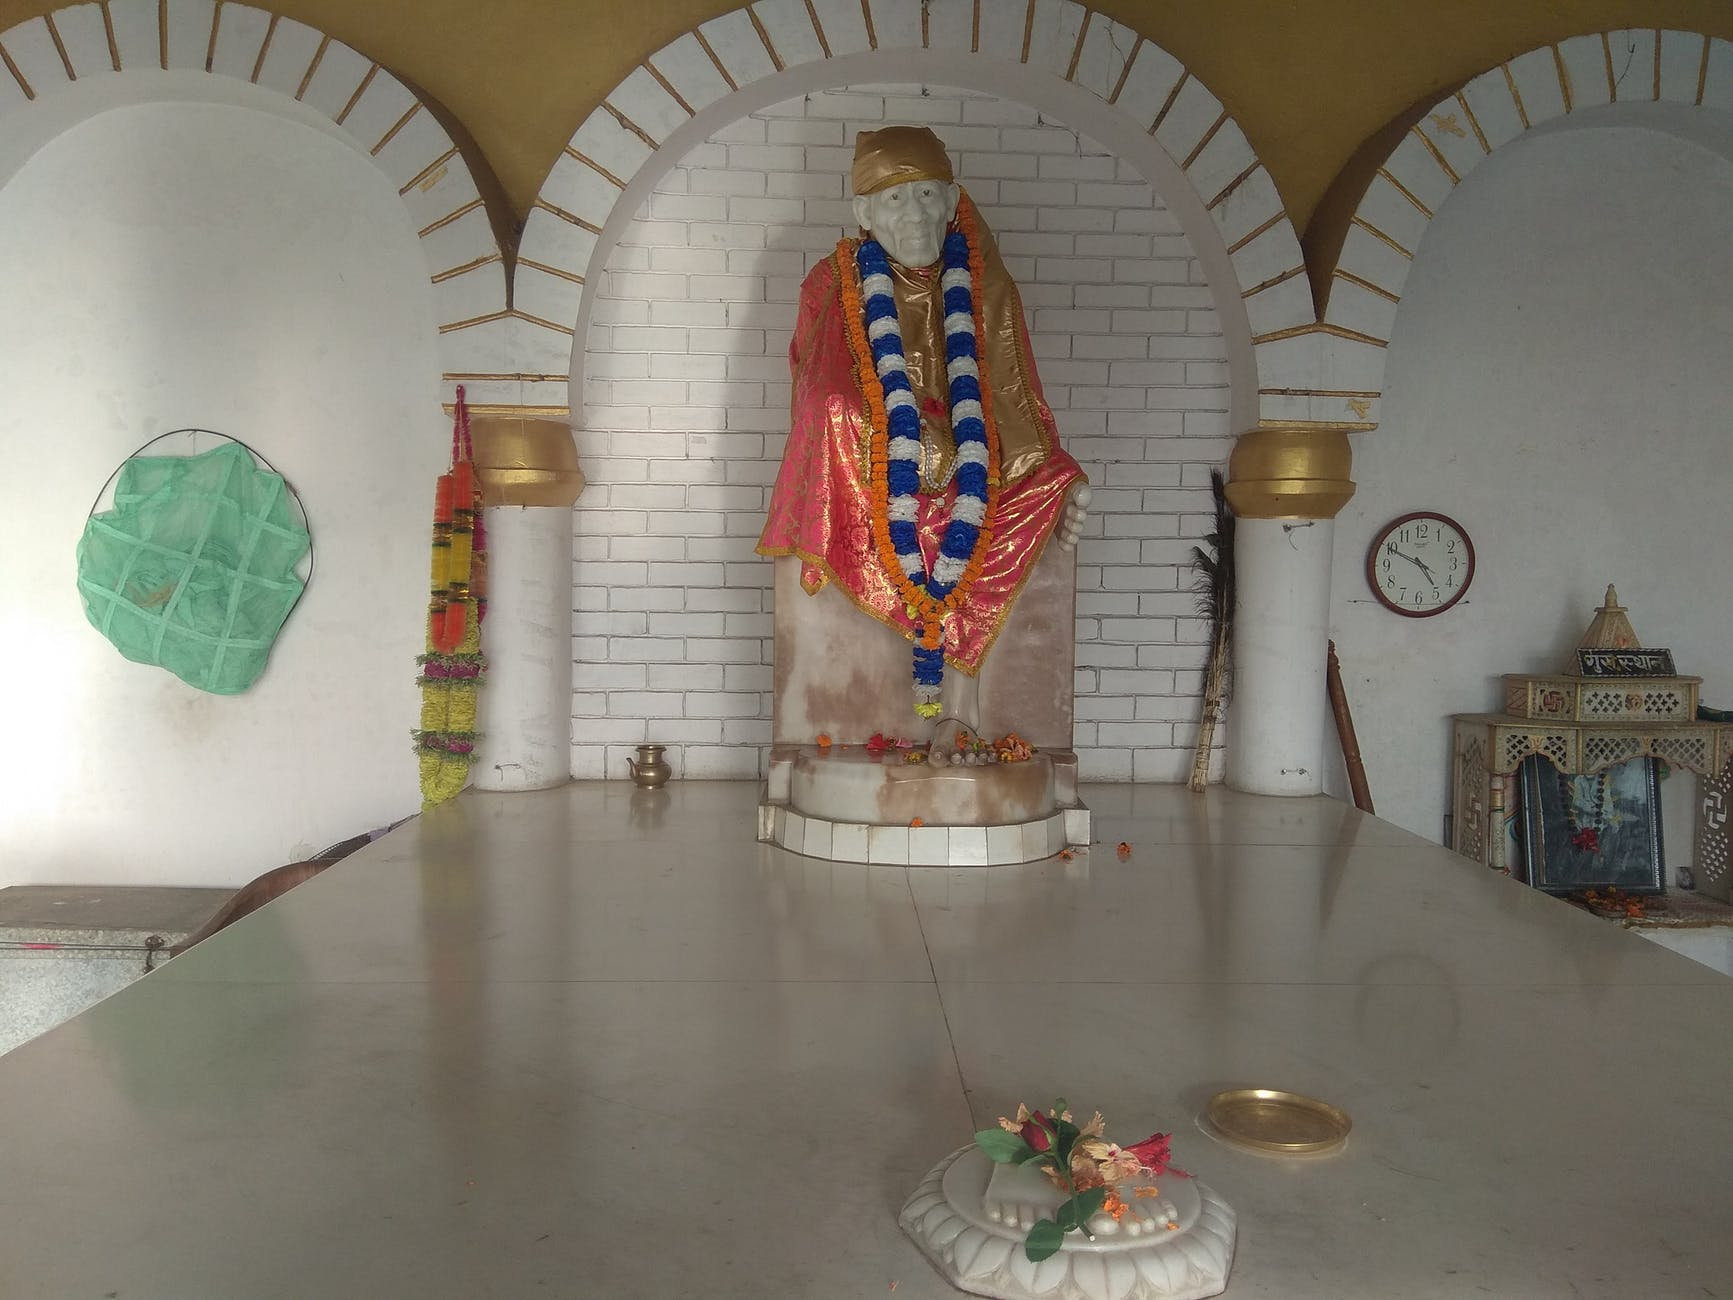 SHRI SHIRDI SAI BABA SANSTHAN, CHHOTA DHAM SHIRDI SAI DHAM, MAHULI, PATNA,BIHAR,INDIA,804453